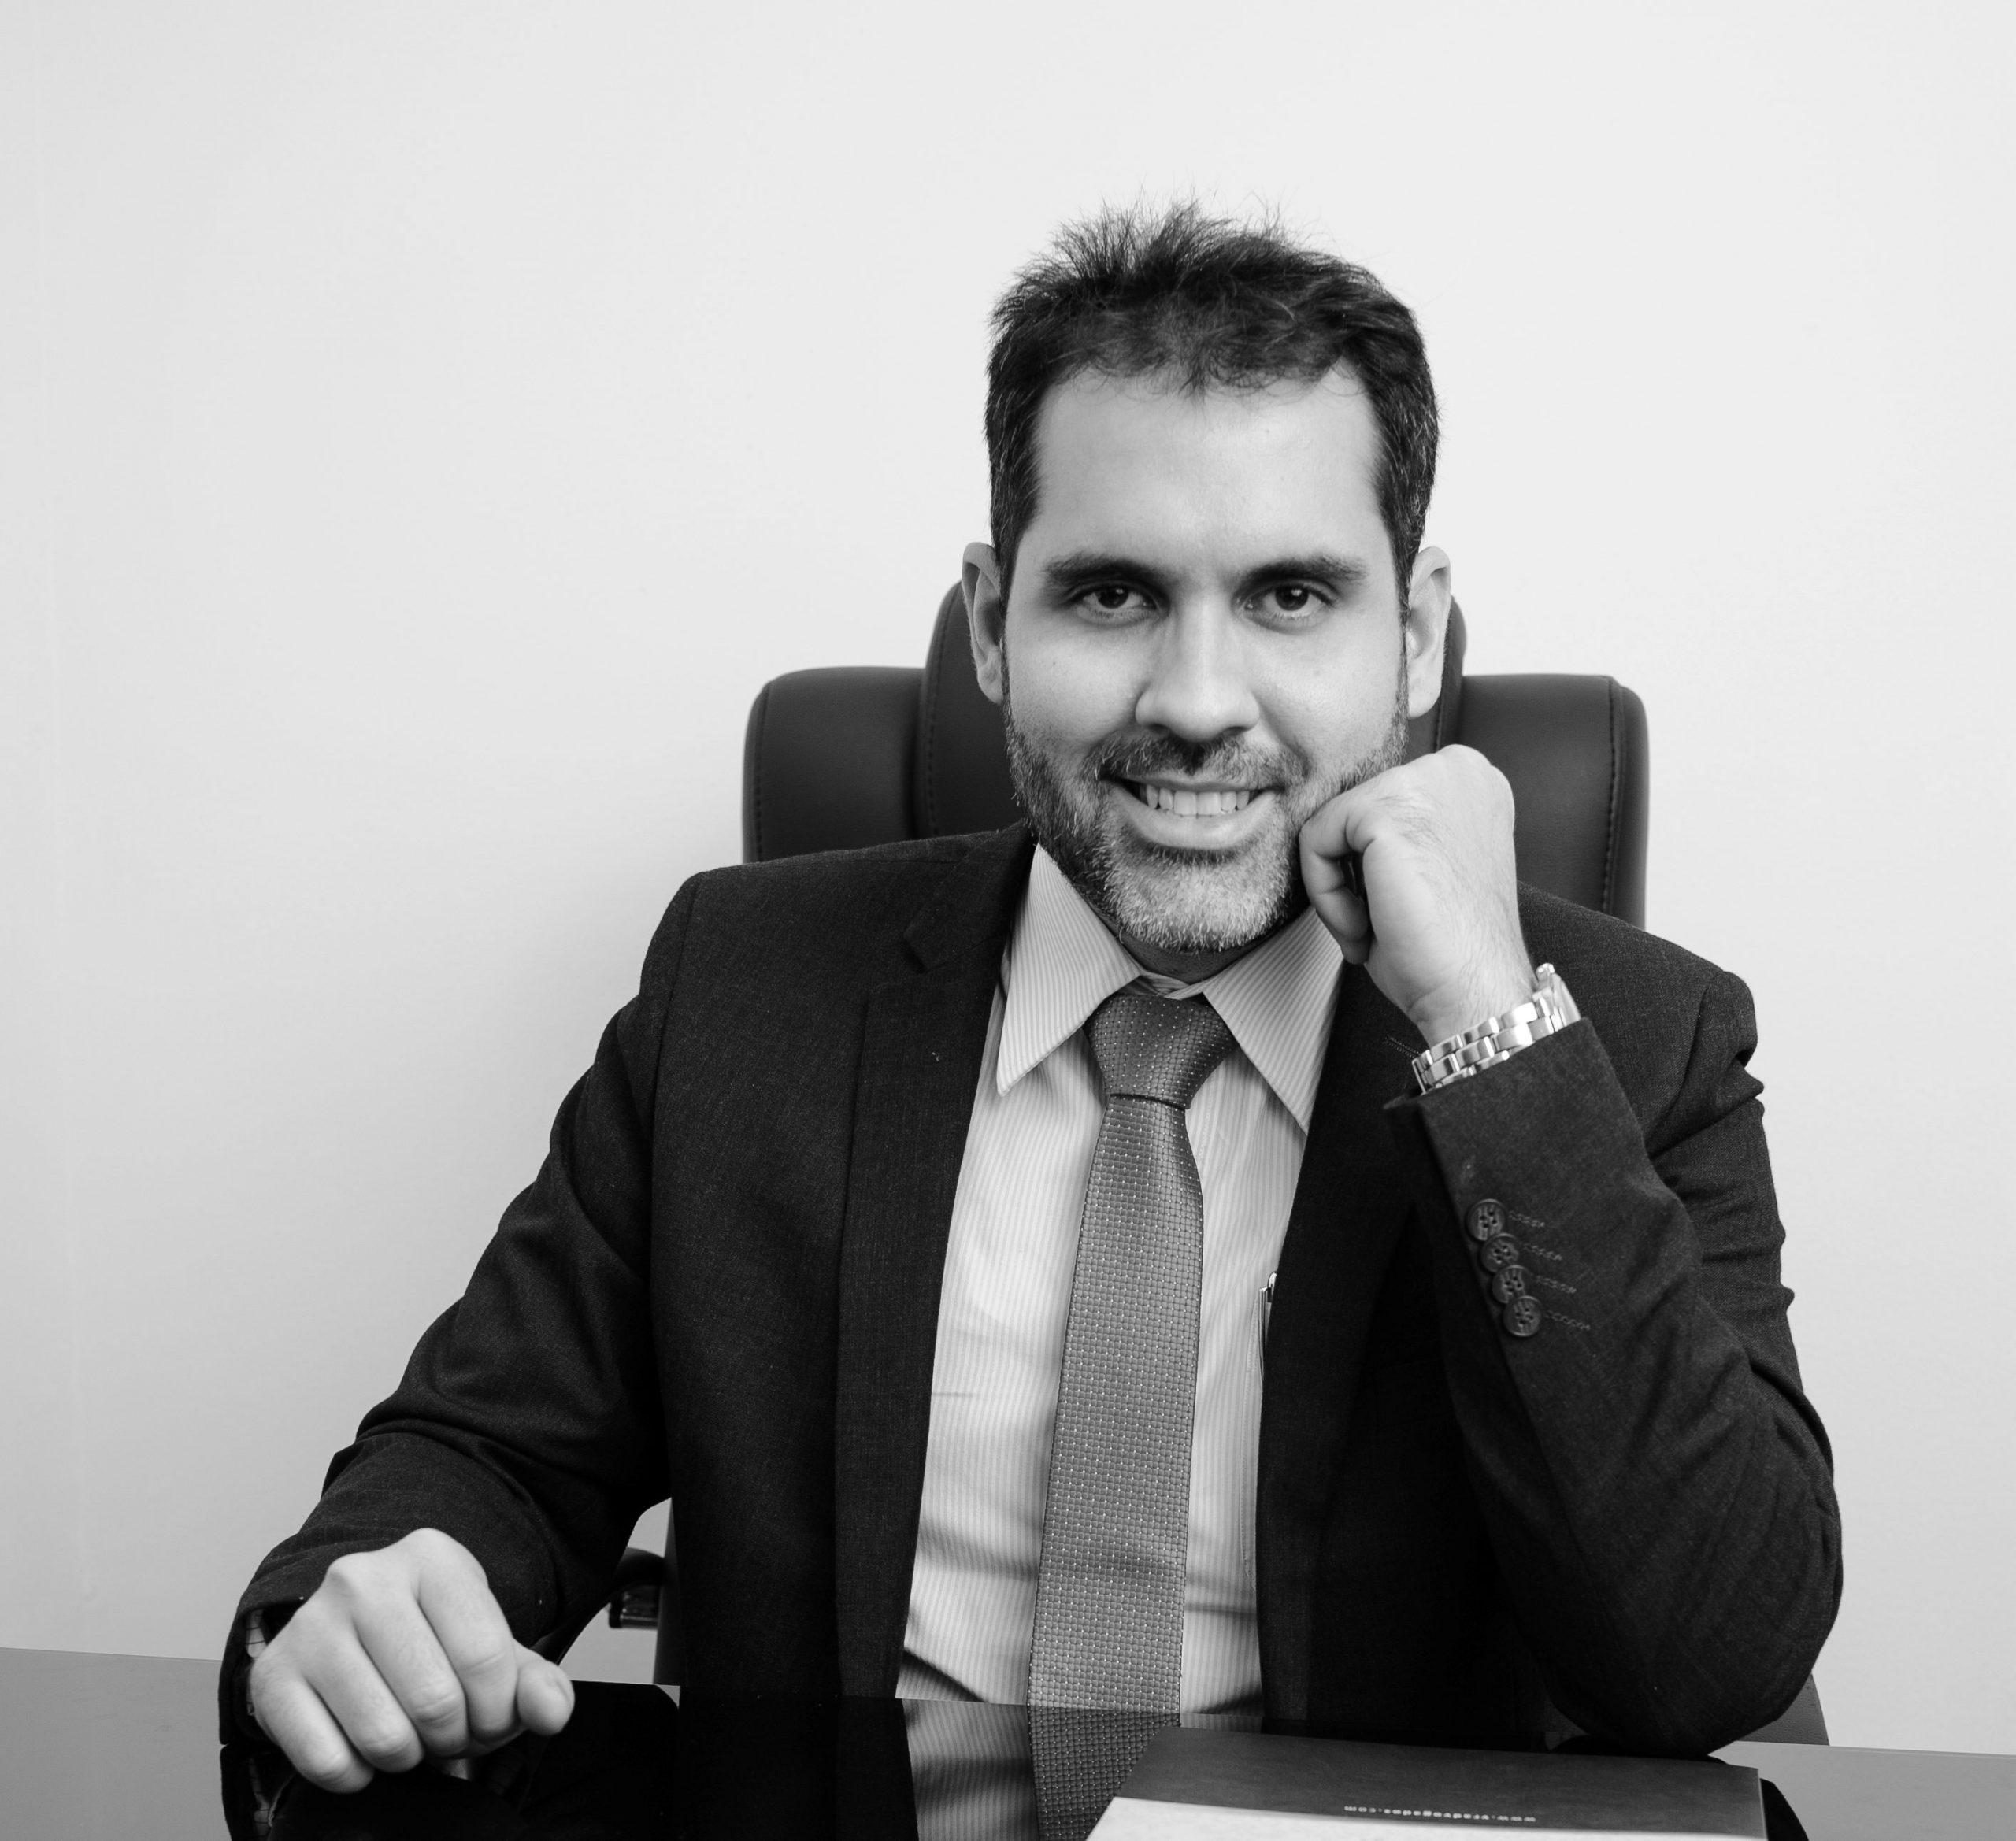 Andre Velloso Henriques